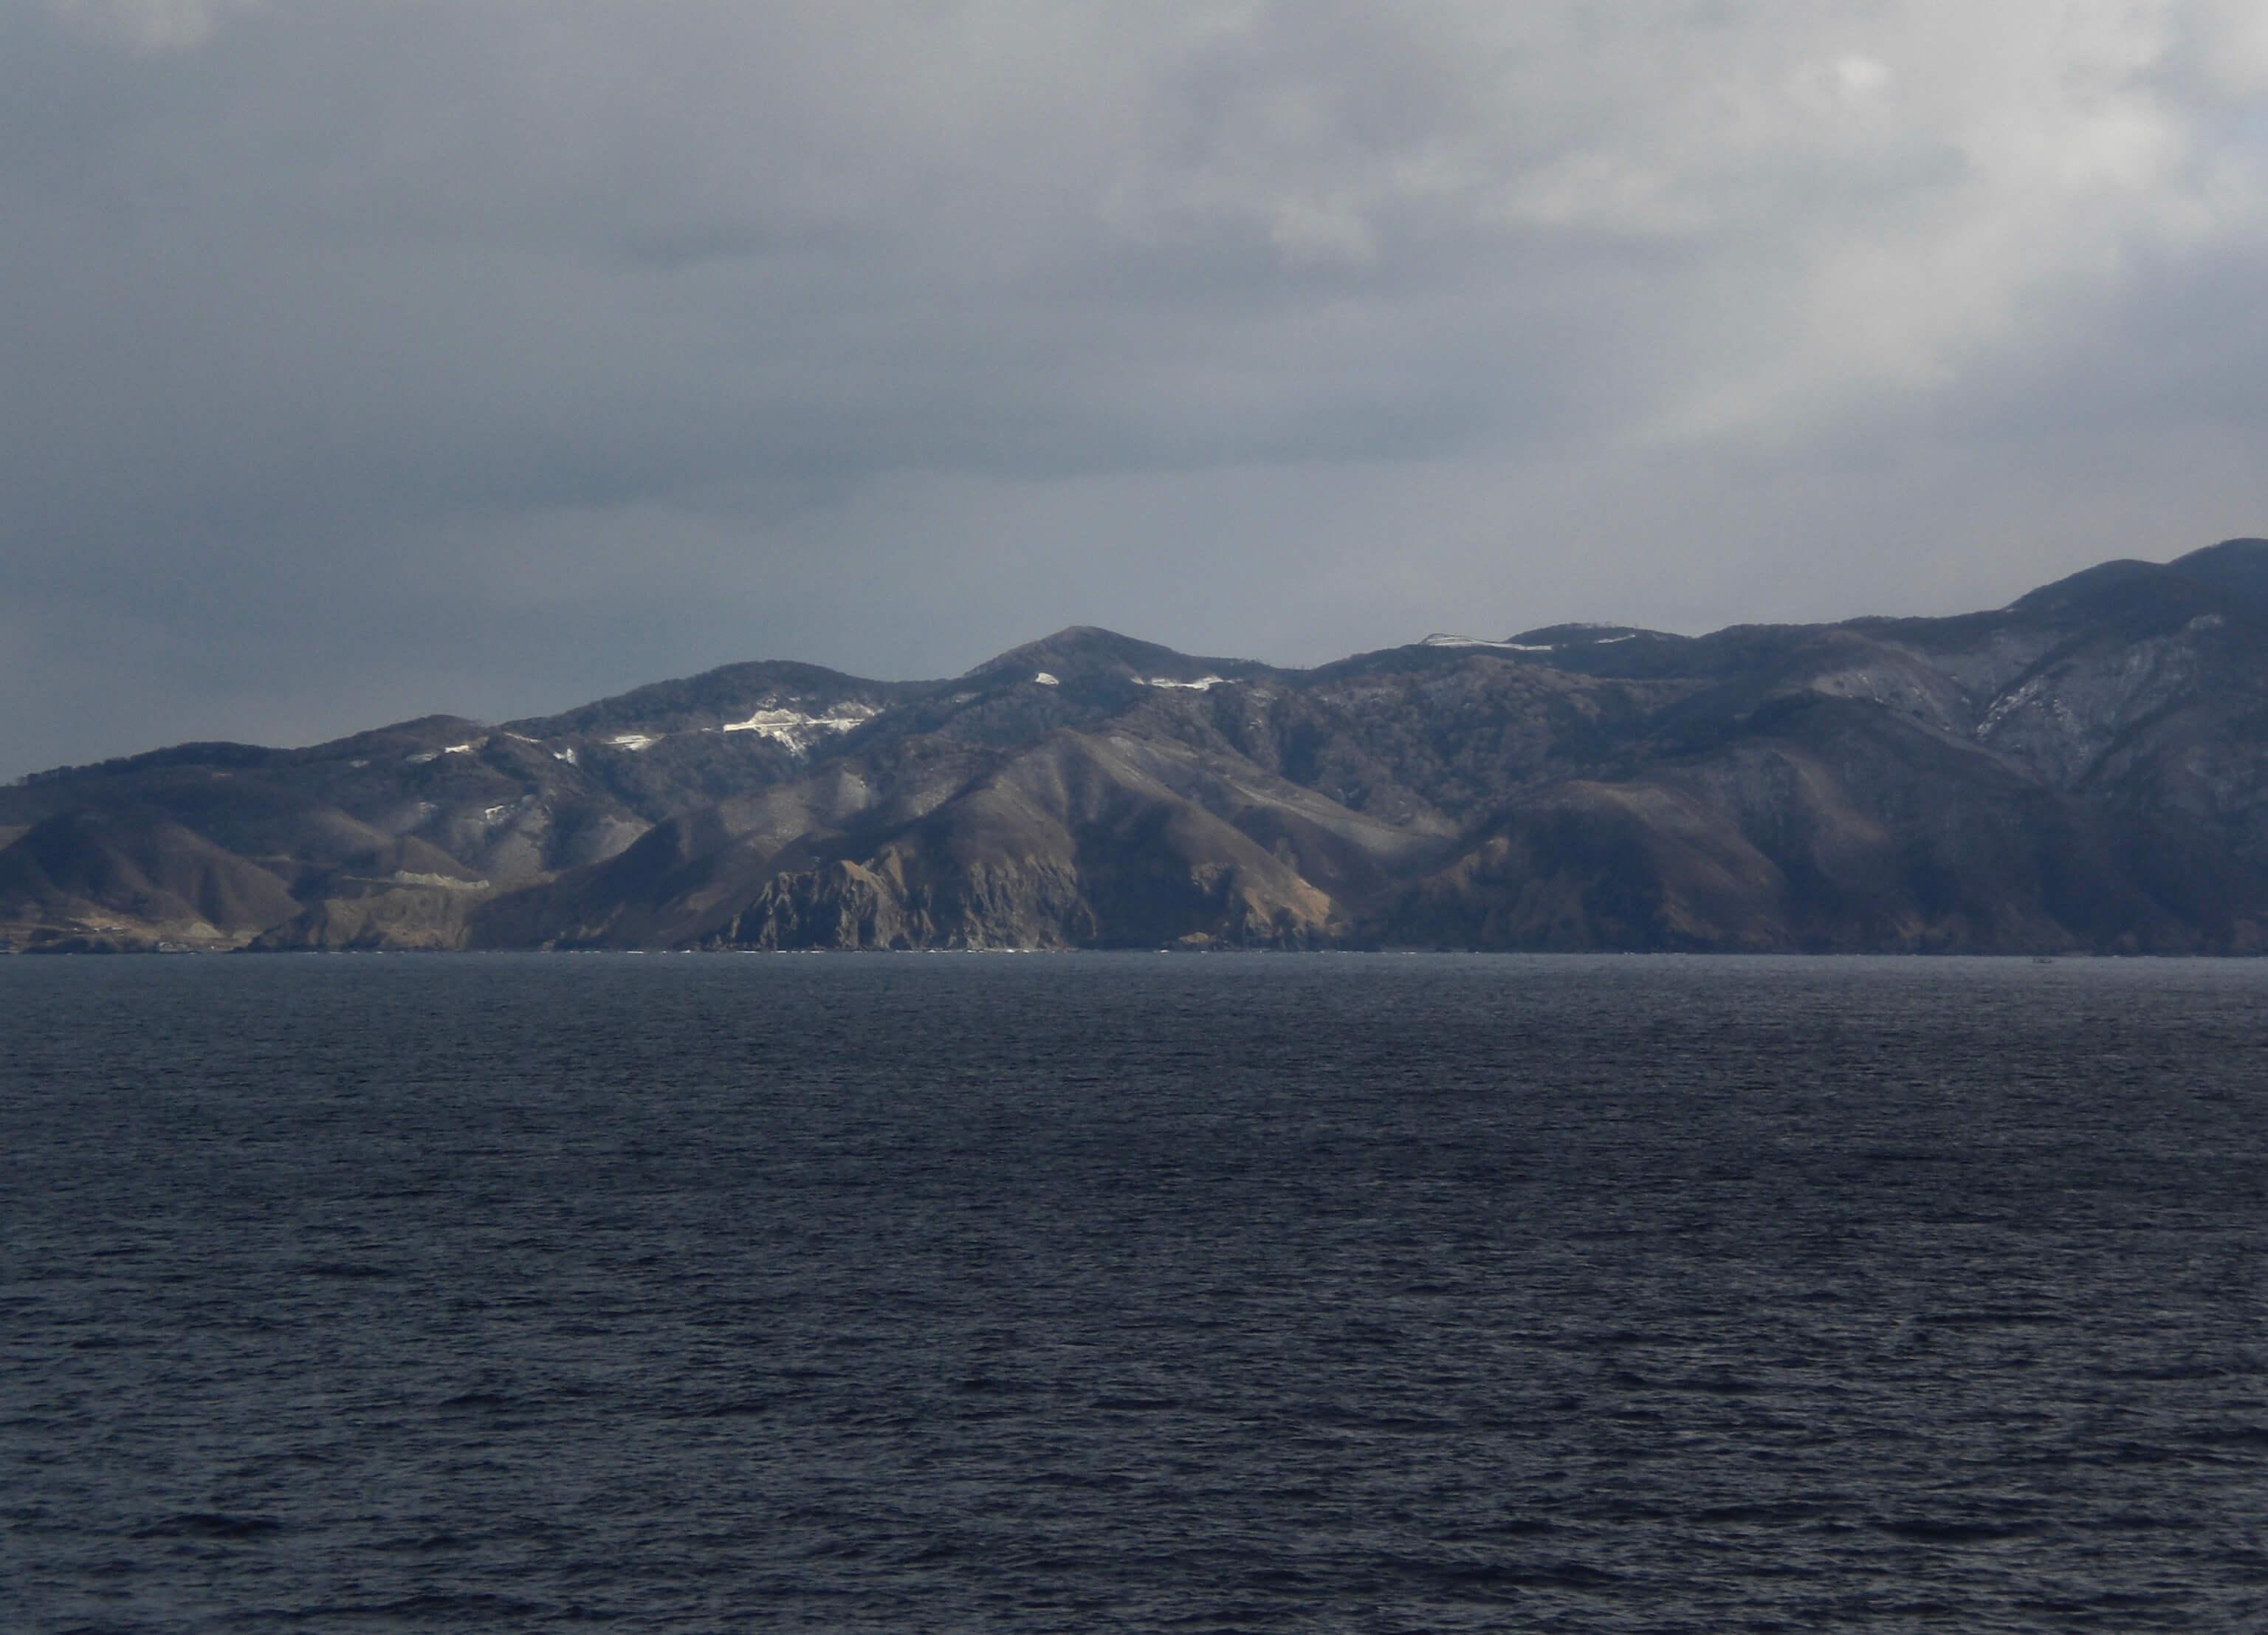 Coastal scenery on the ferry to Hokkaido